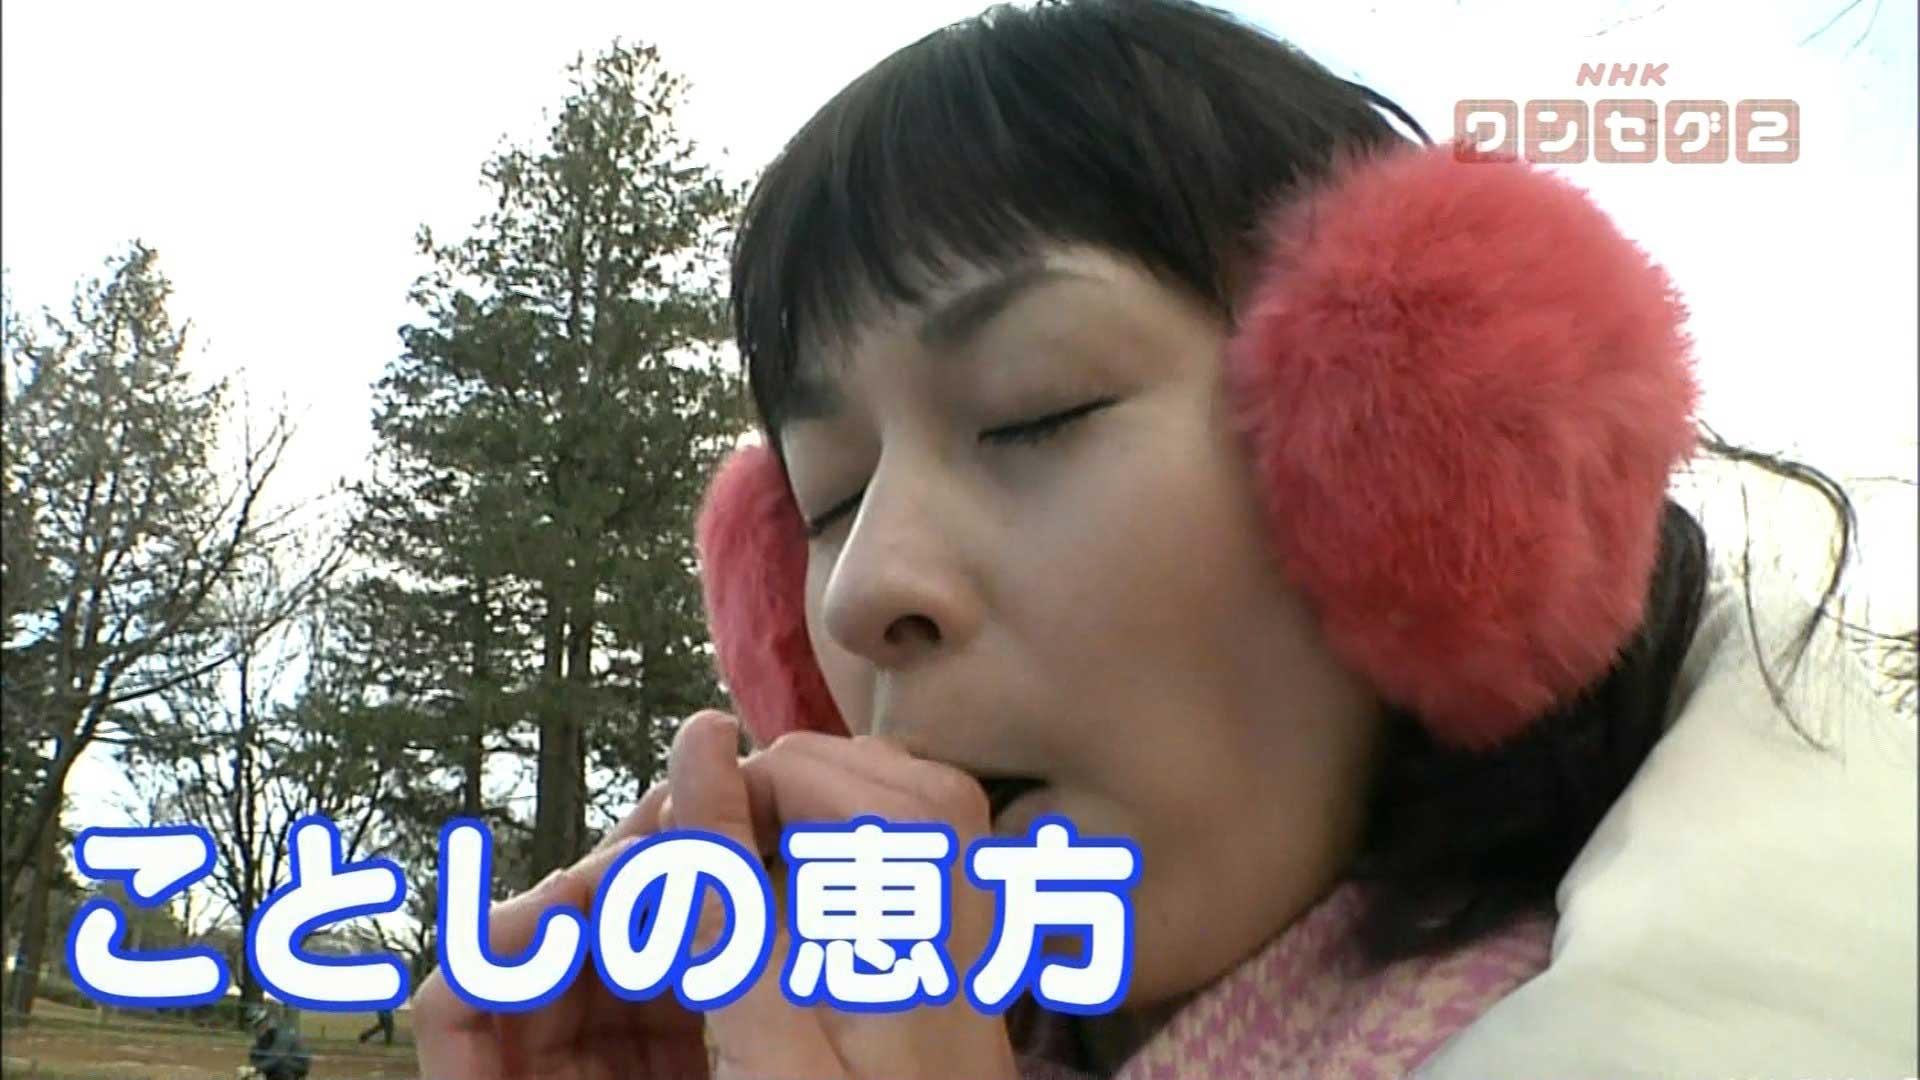 NHK女子アナ ブラタモリ 久保田祐佳 顔アップ セクシー口開け恵方巻きを食べる エロかわいい画像